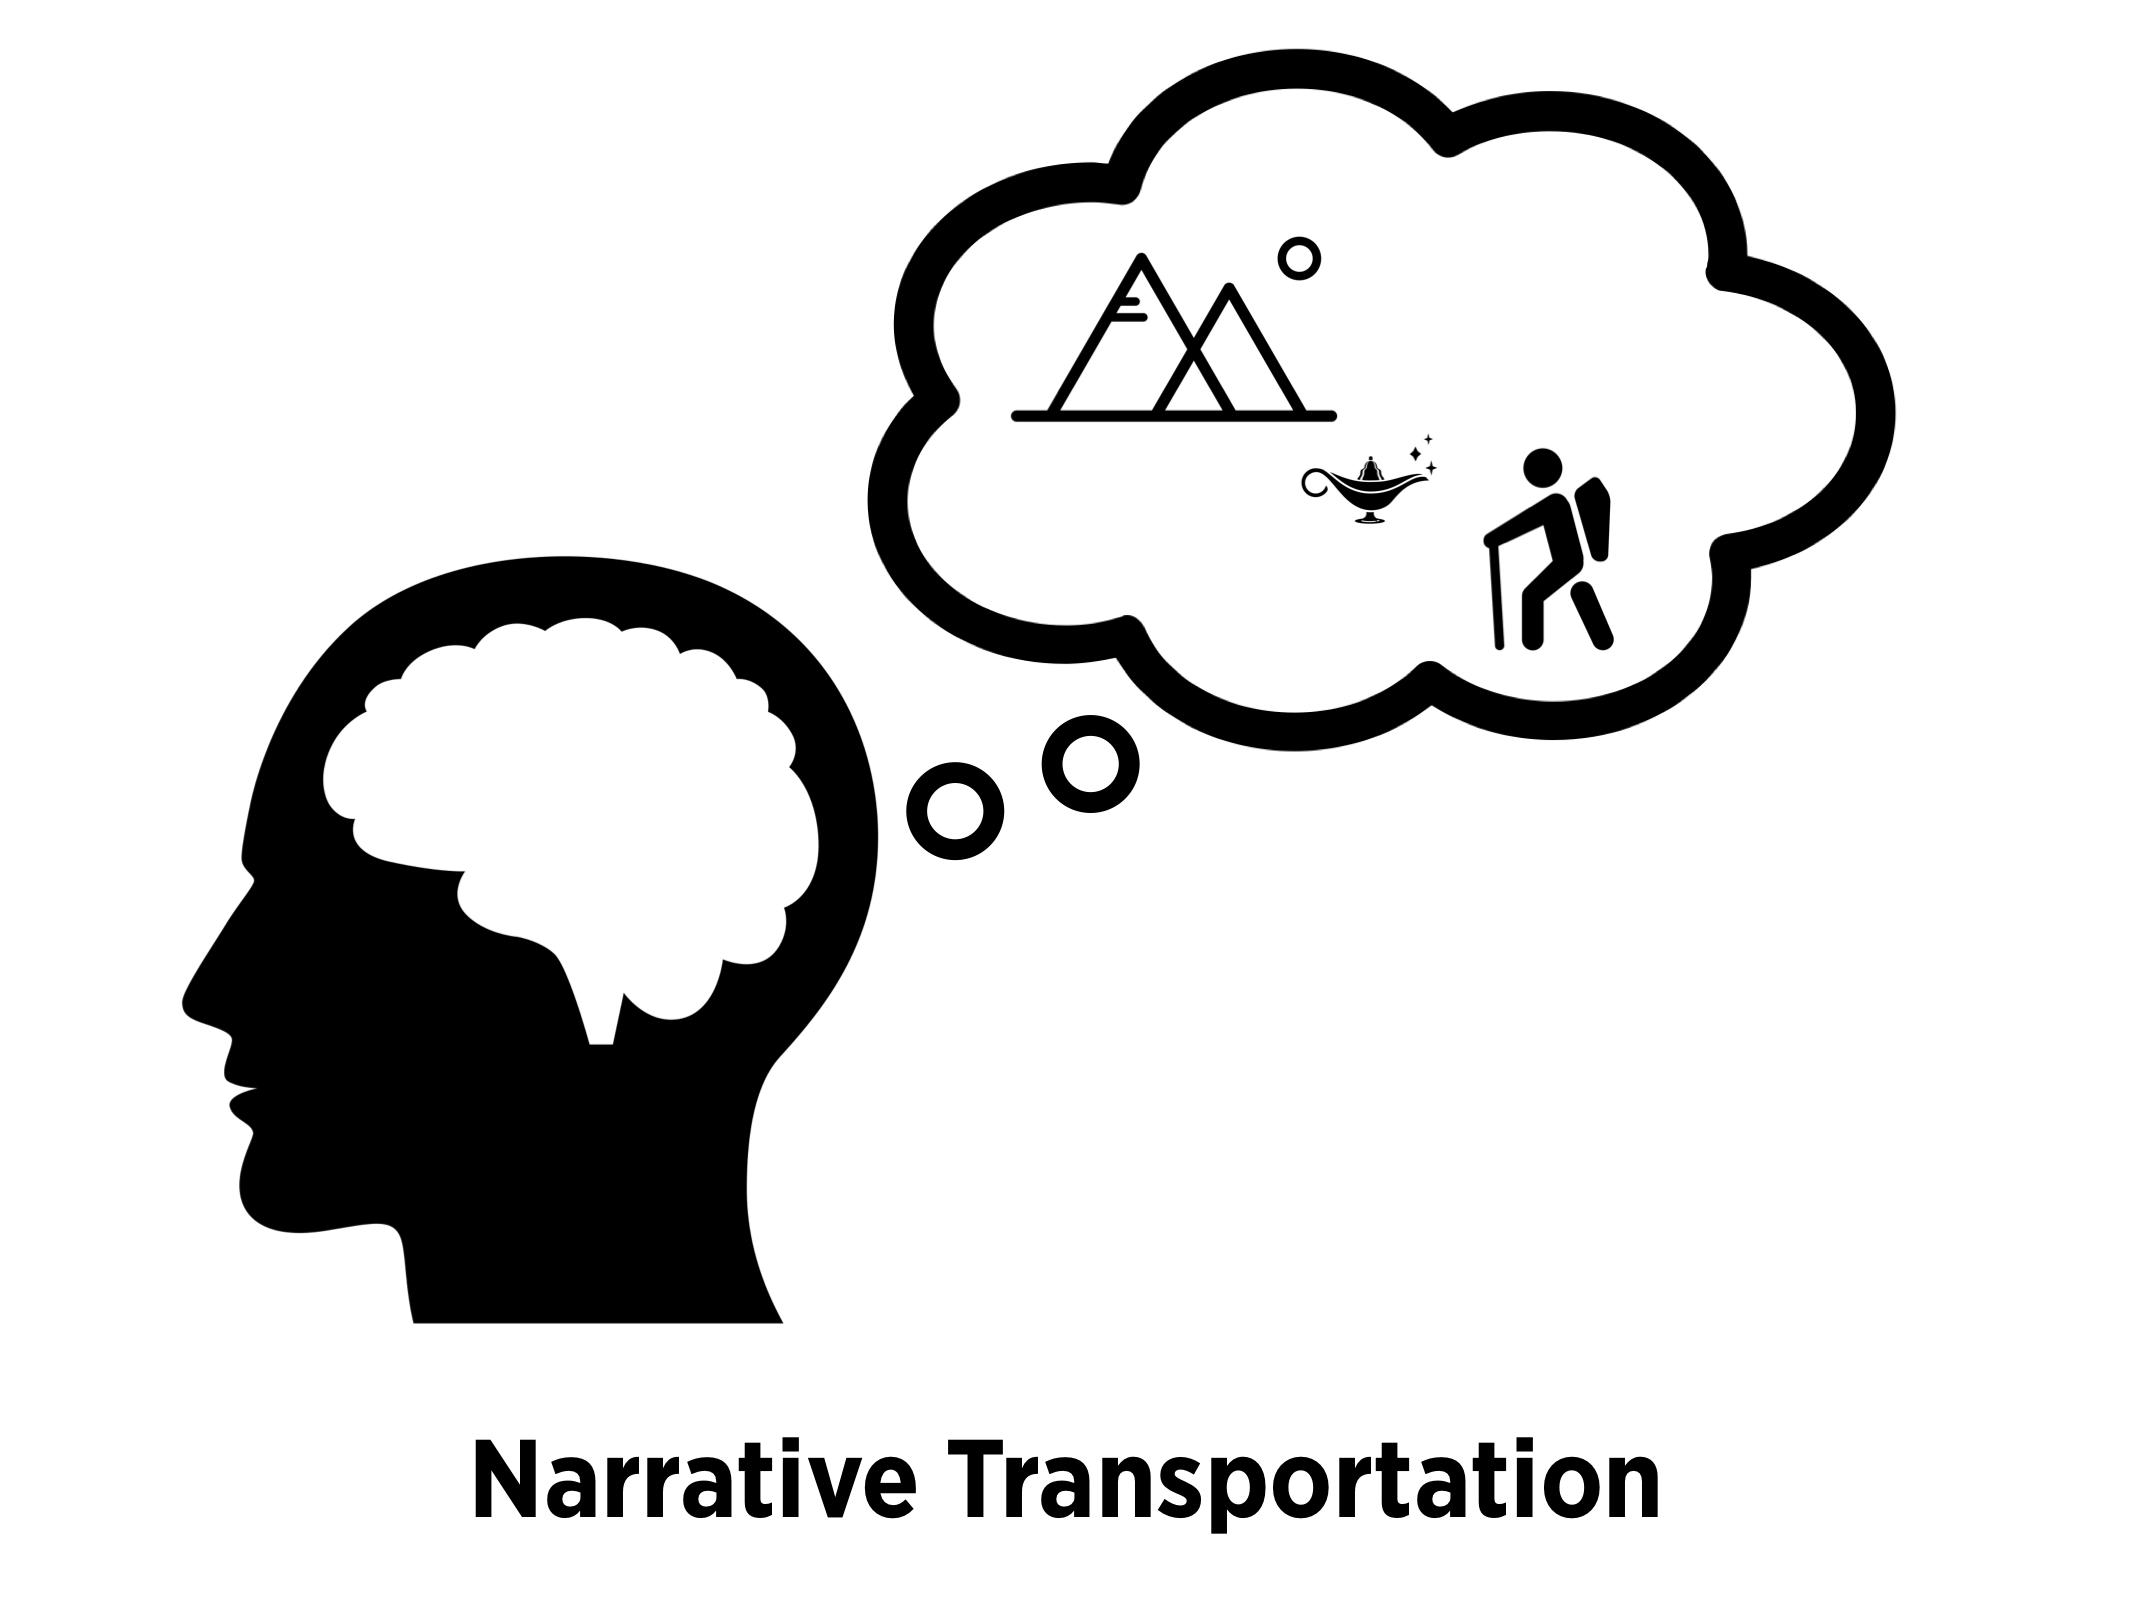 narrative-transportation.png